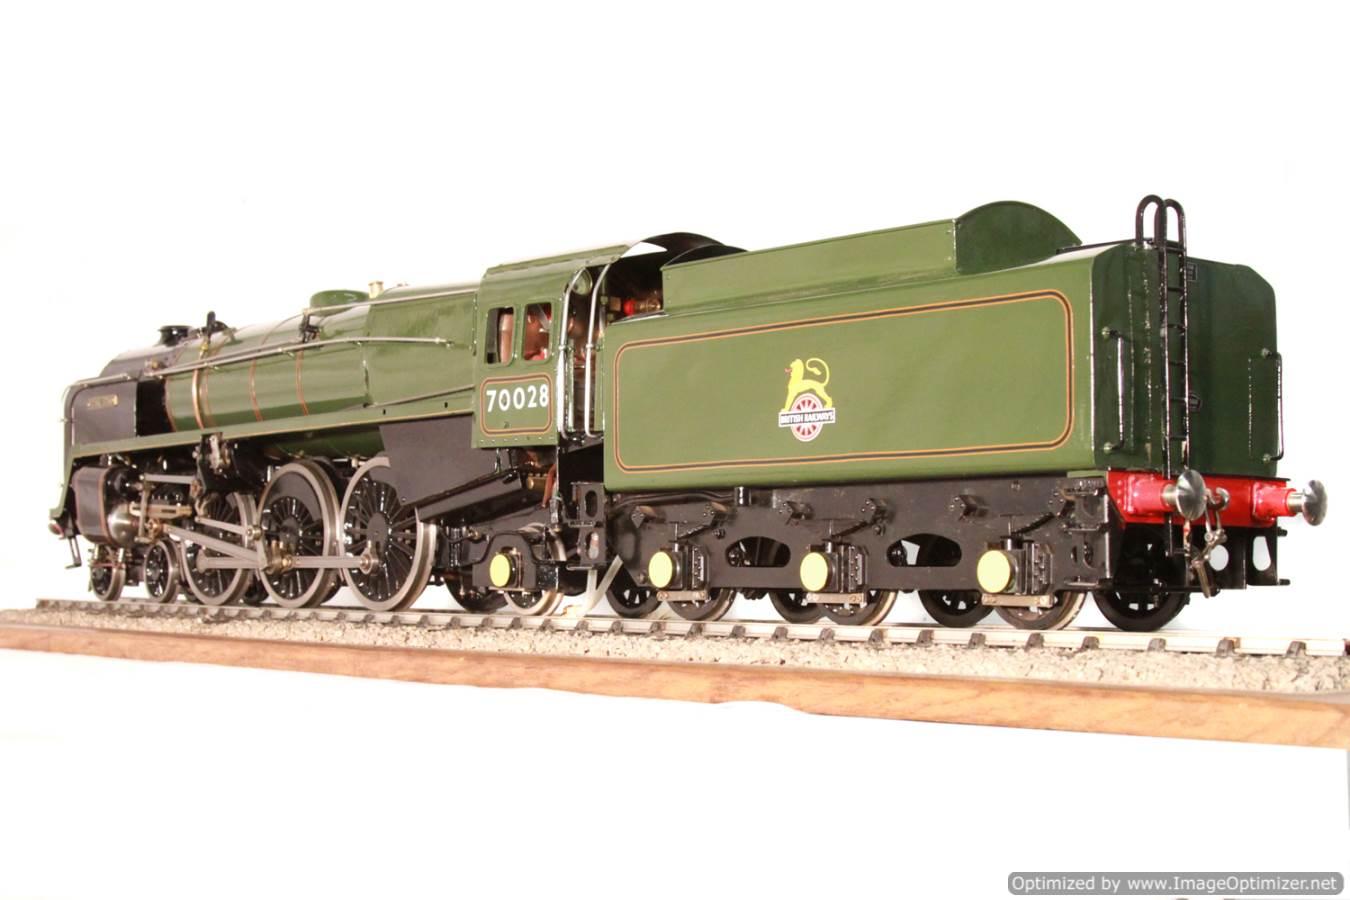 test BR Britannia live steam locomotive for sale 29 Optimized